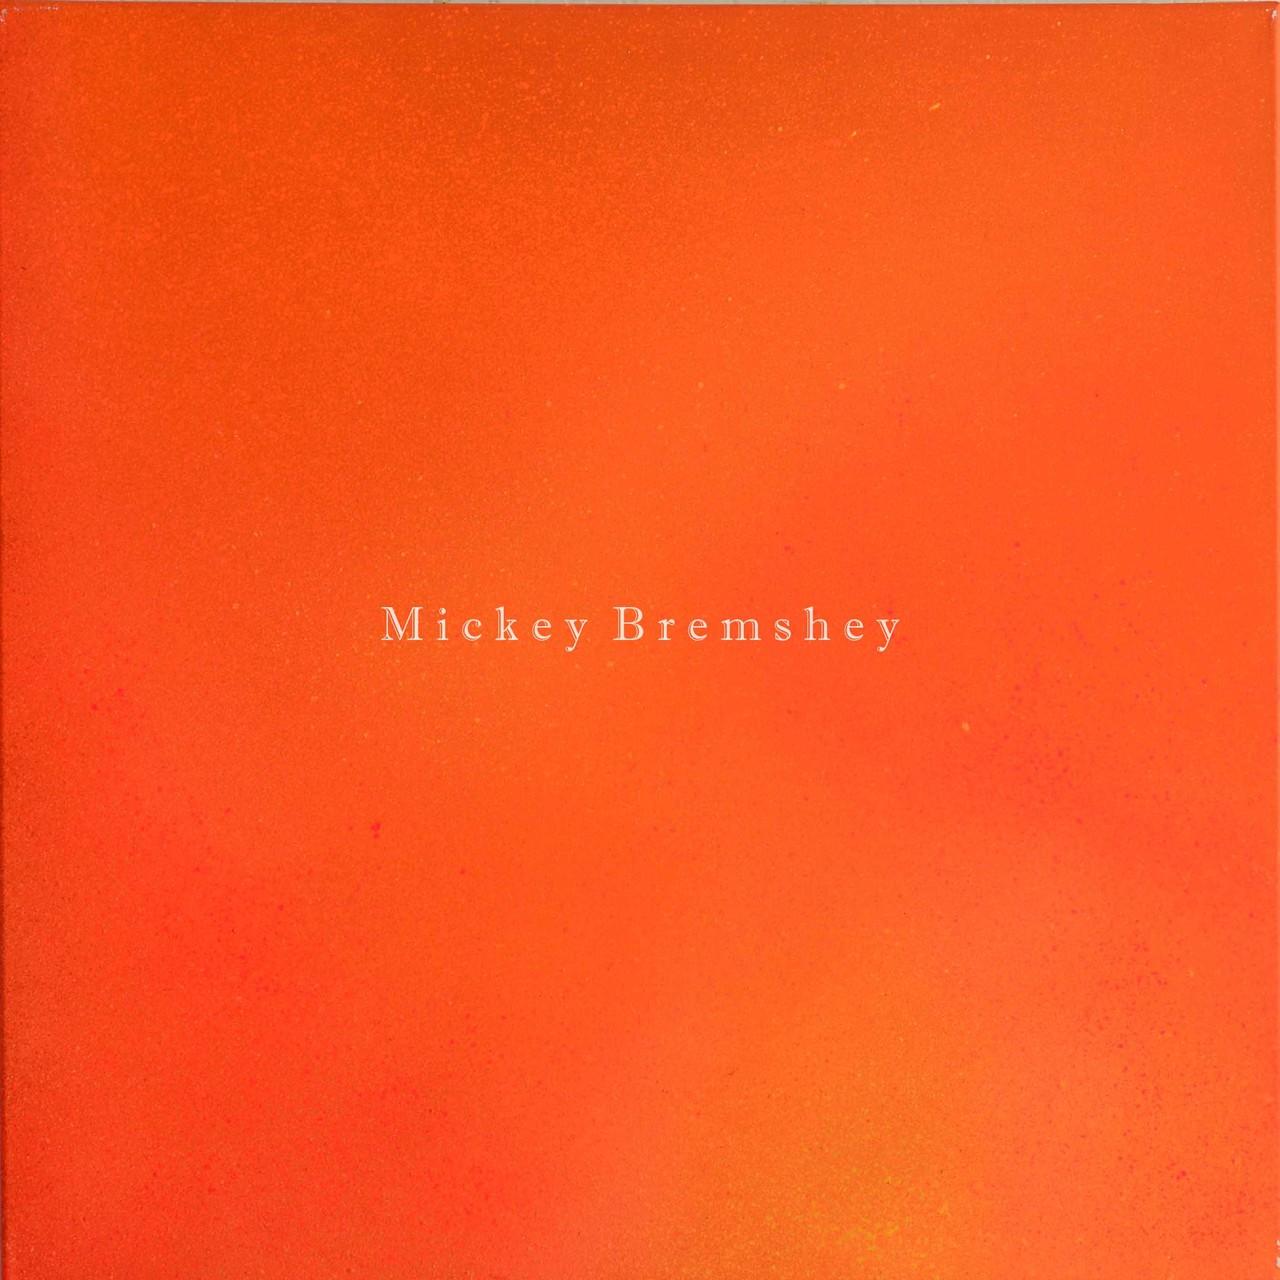 bremshey.illuminare.081275-002-t